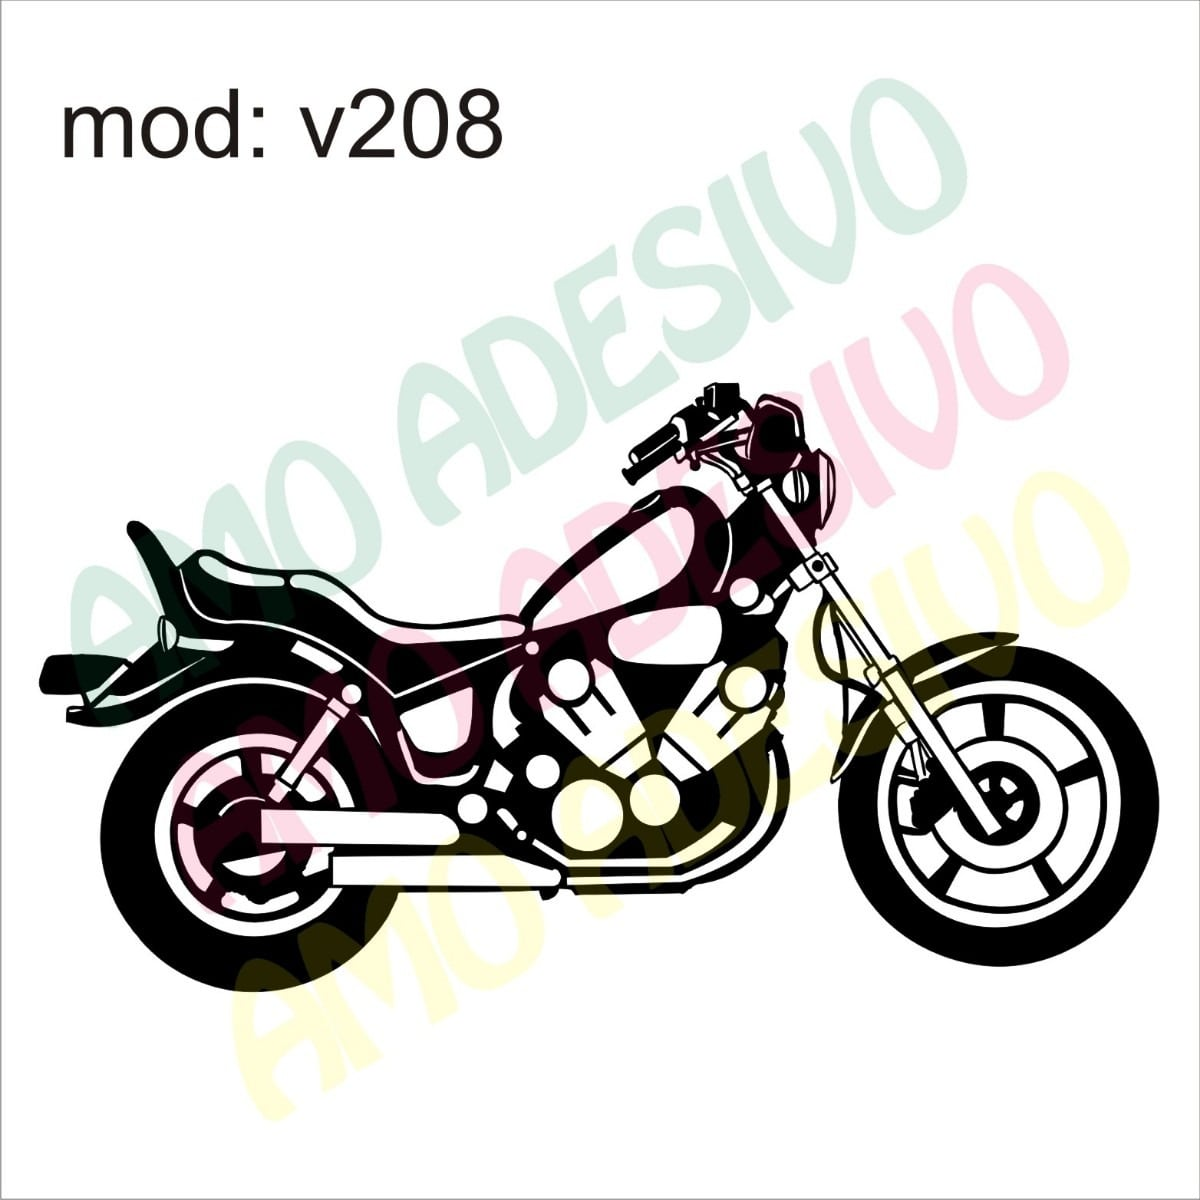 Adesivo V208 Moto Desenho Abstrato Decorativo Parede